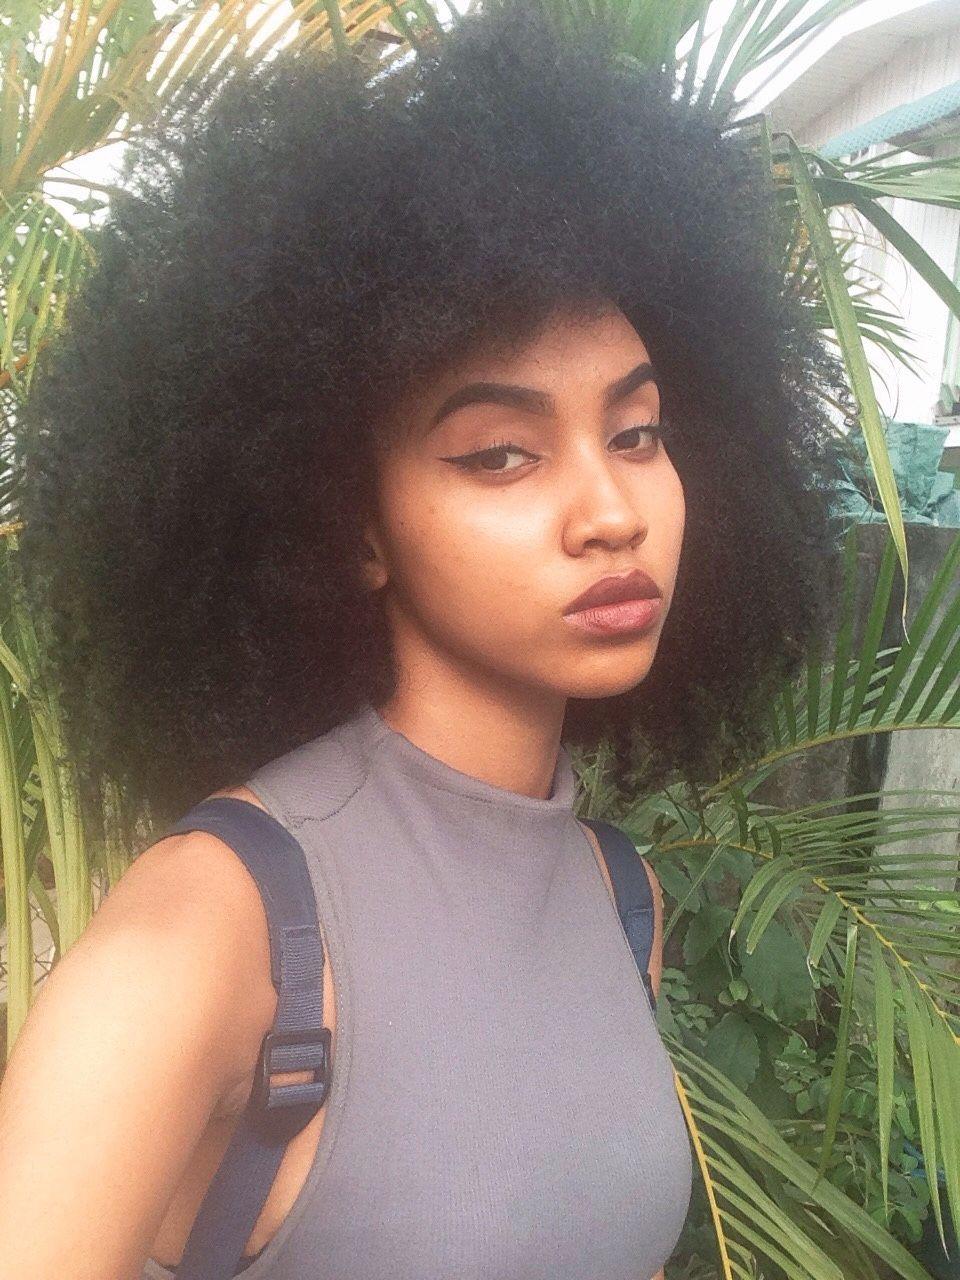 Pin by rewina afewerki on gurlz pinterest natural hair goals